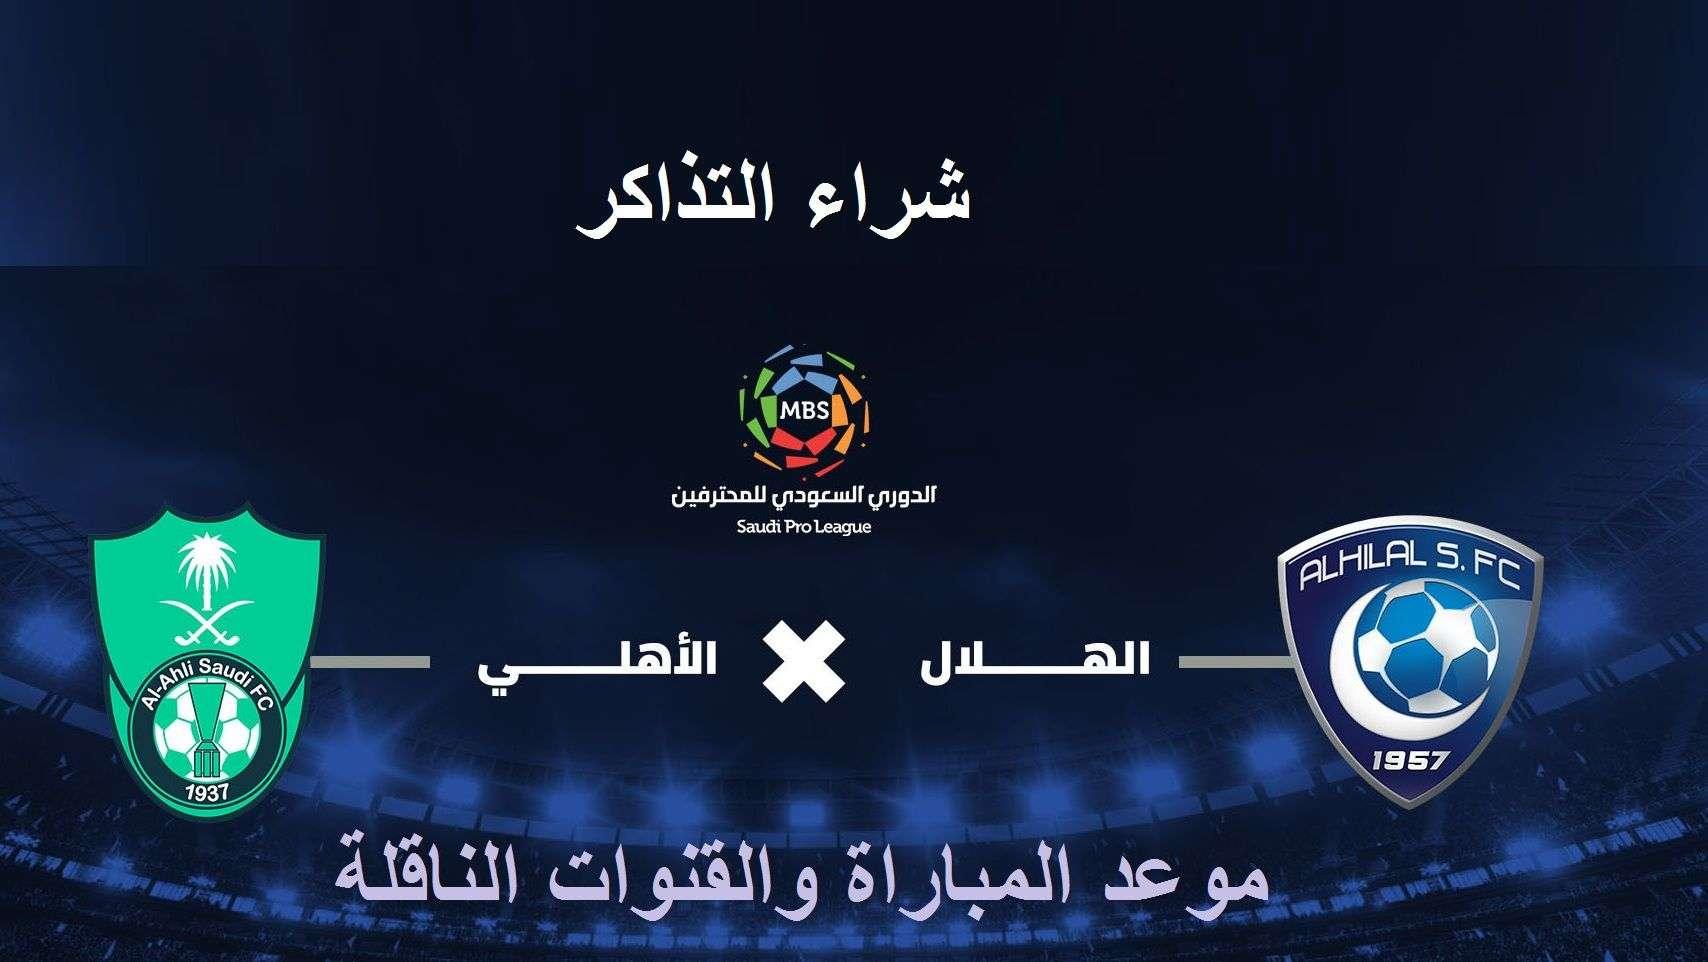 Photo of نتيجة قاسية في مباراة الهلال والأهلي